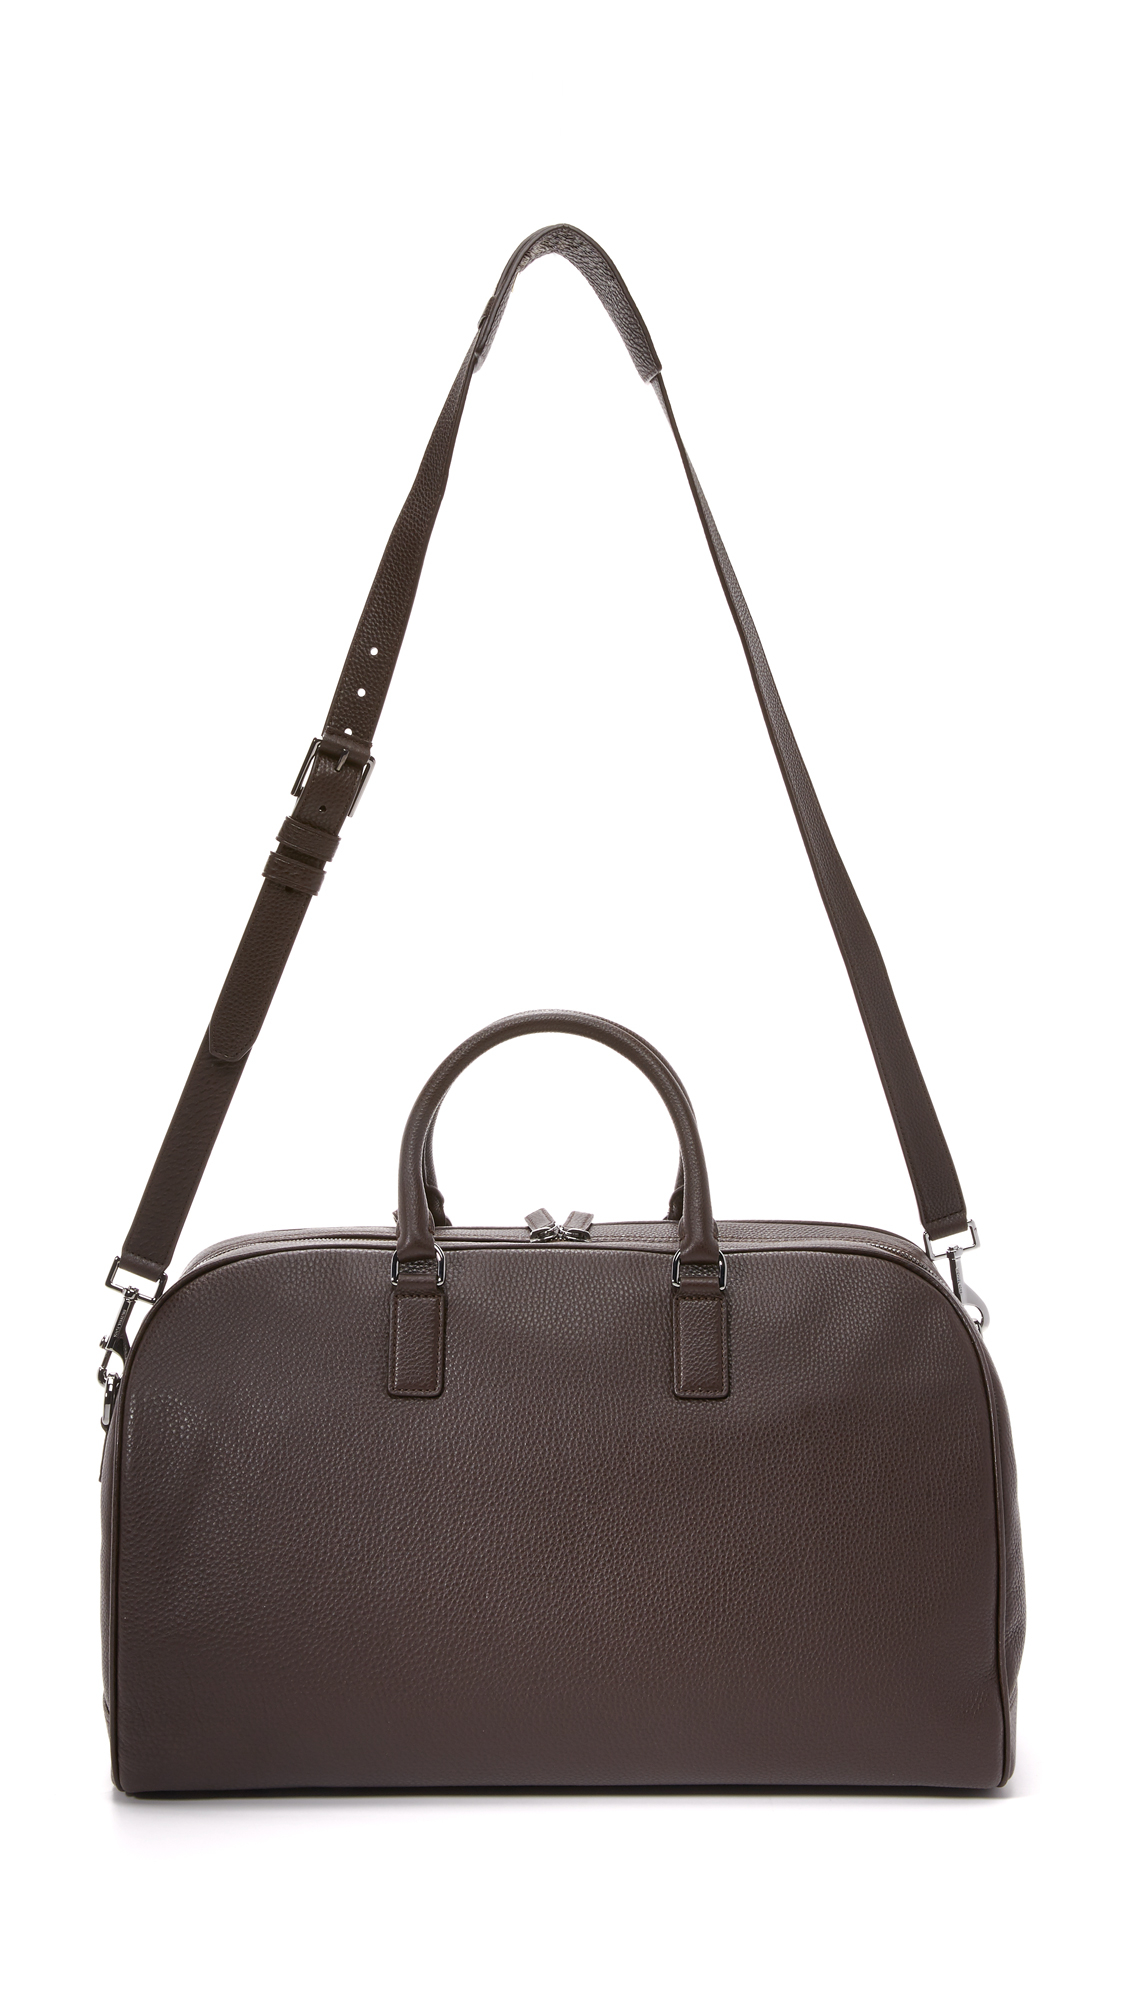 michael kors bryant pebbled leather large duffel bag in. Black Bedroom Furniture Sets. Home Design Ideas